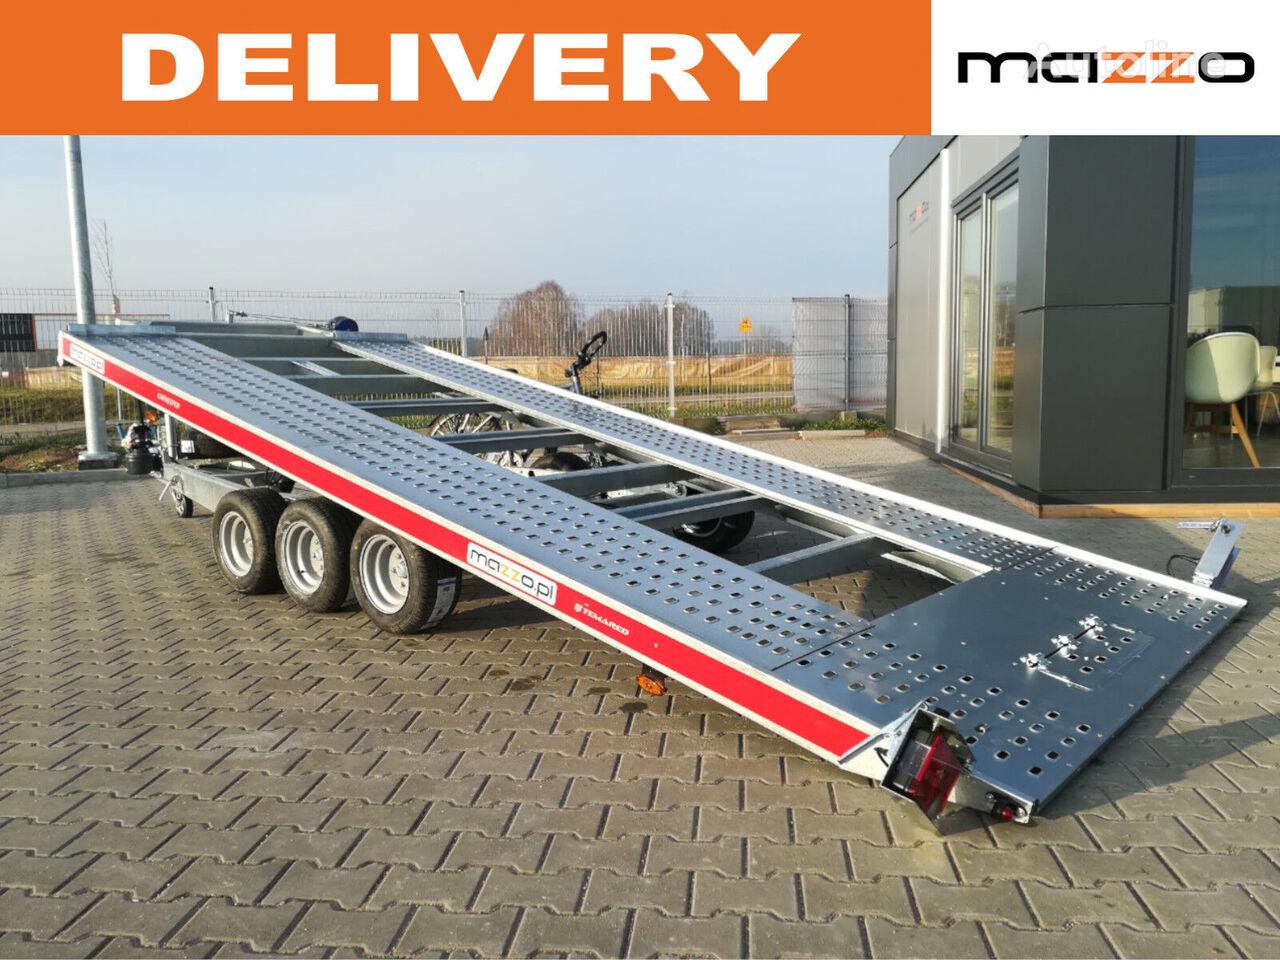 480x203cm 4820/3 3-axles Tilt trailer with hand pump! remolque portacoches nuevo